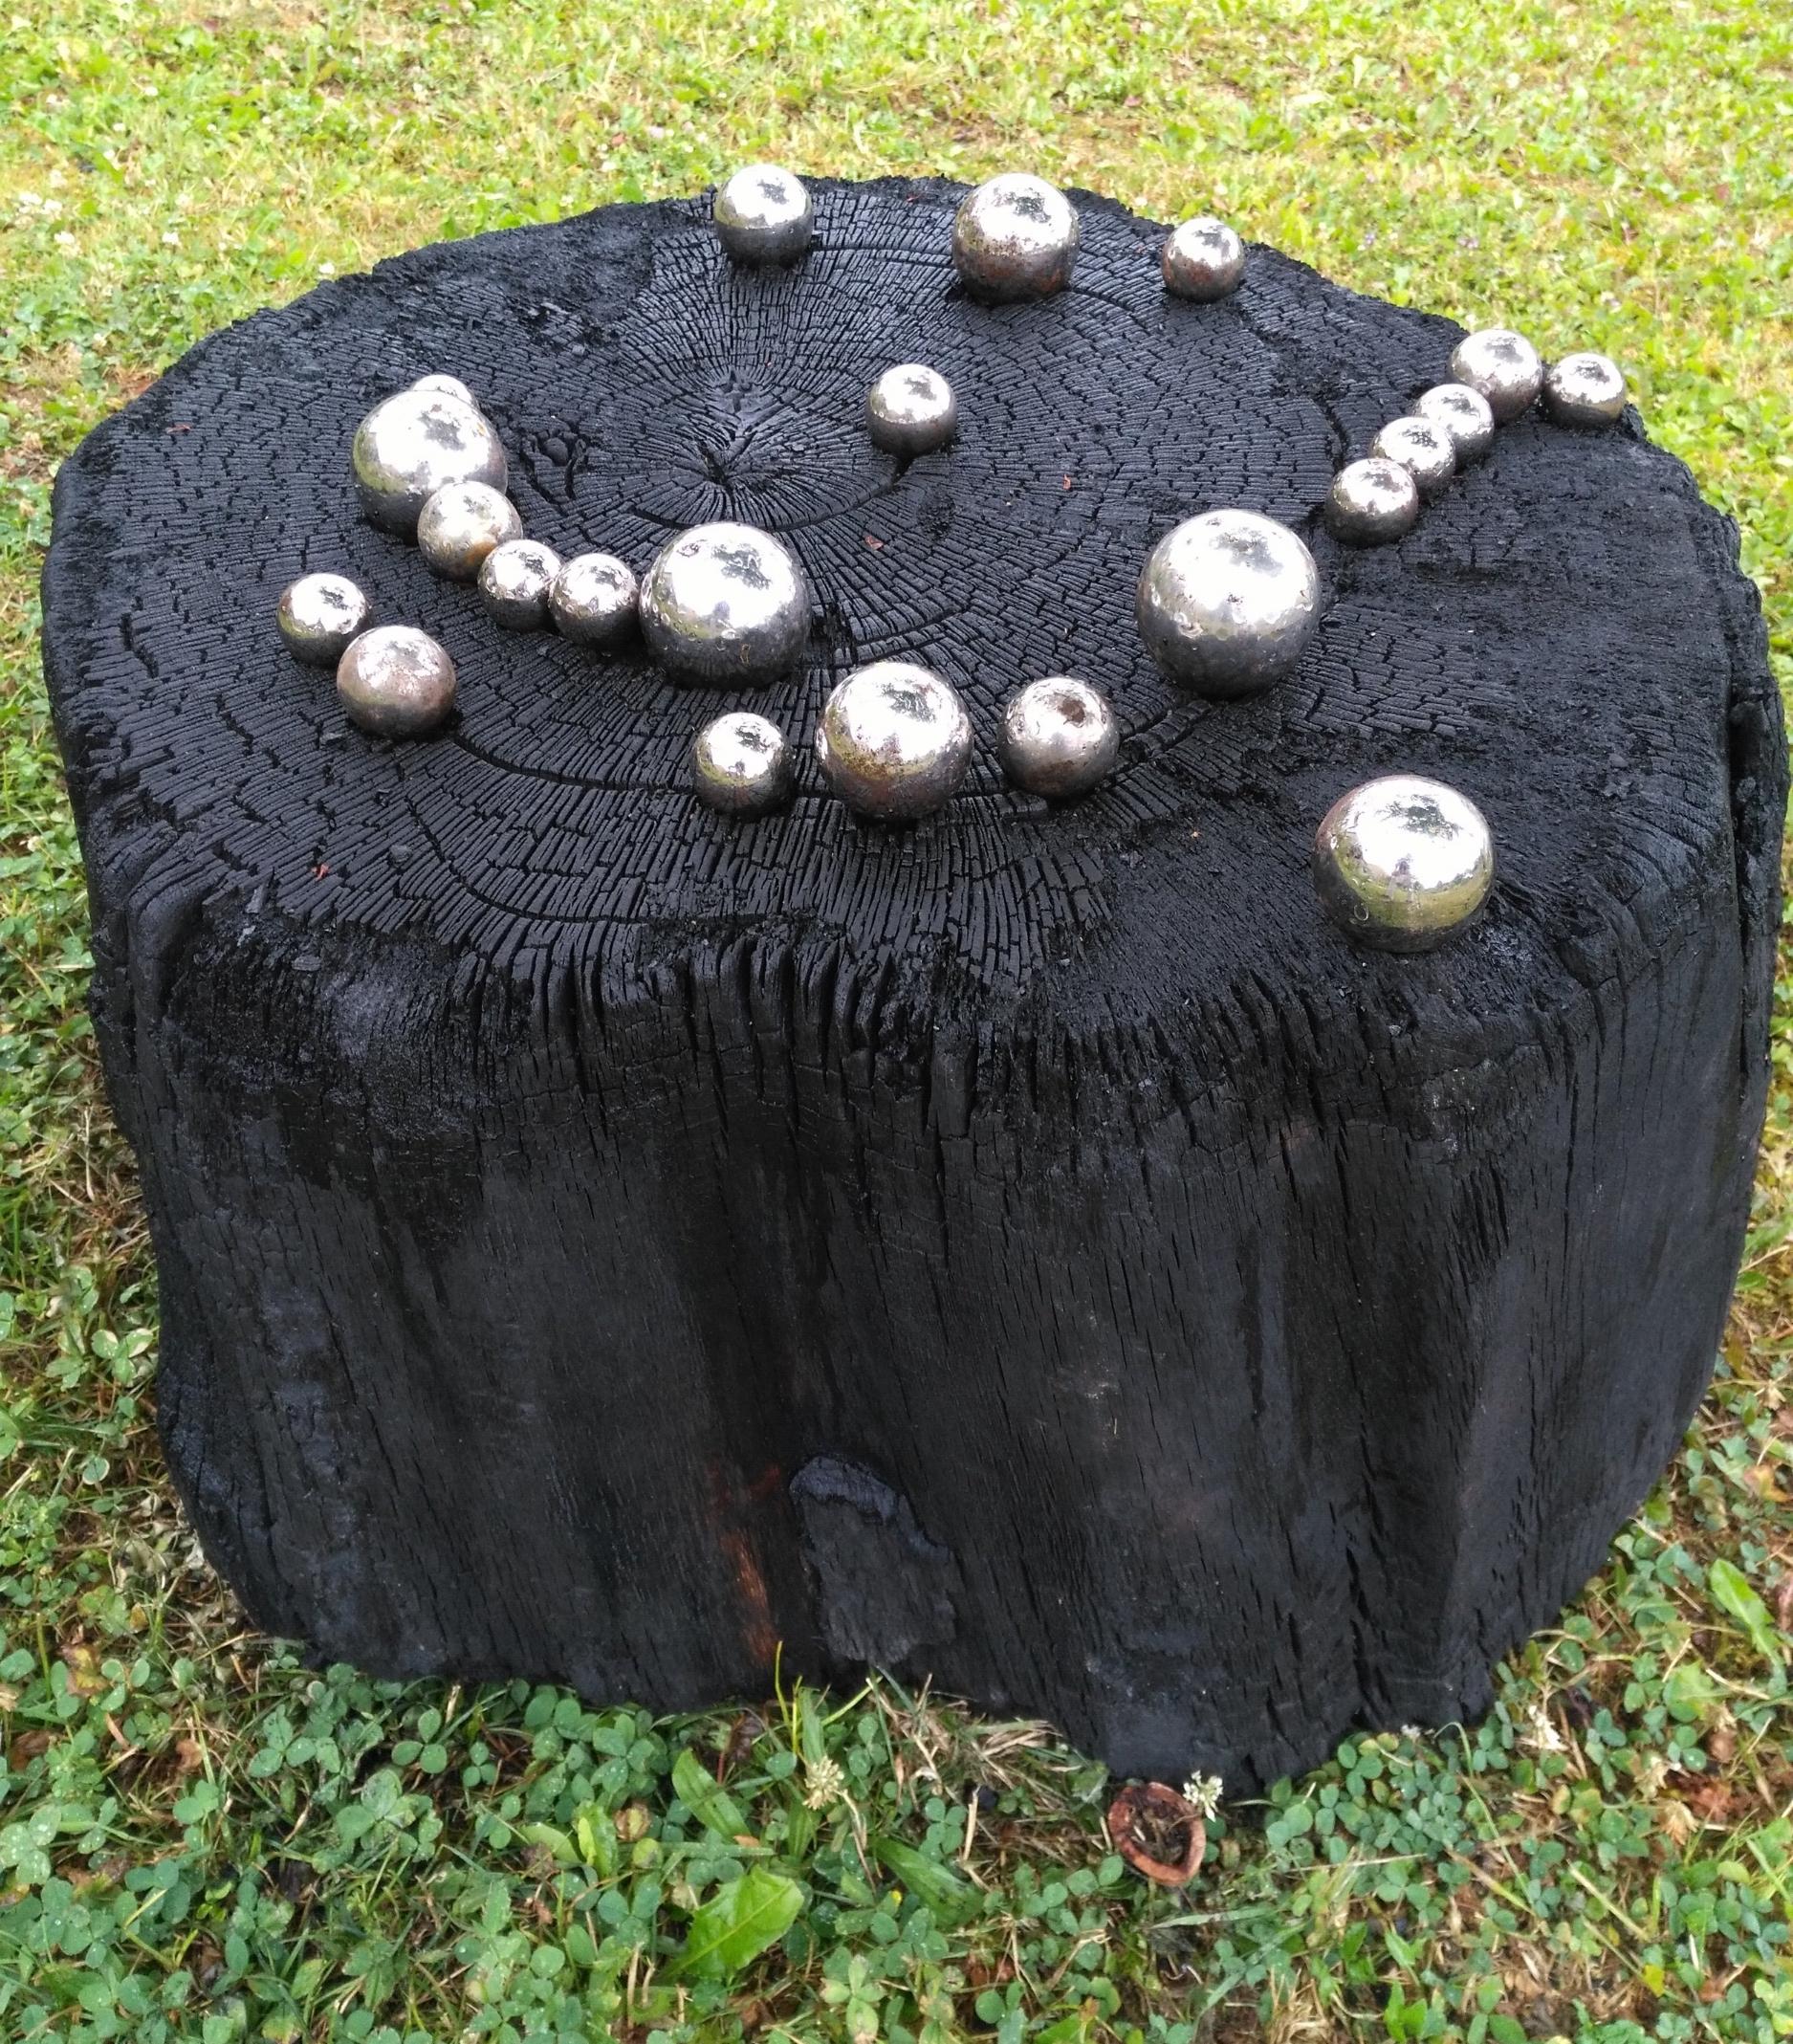 Steel Balls at rest